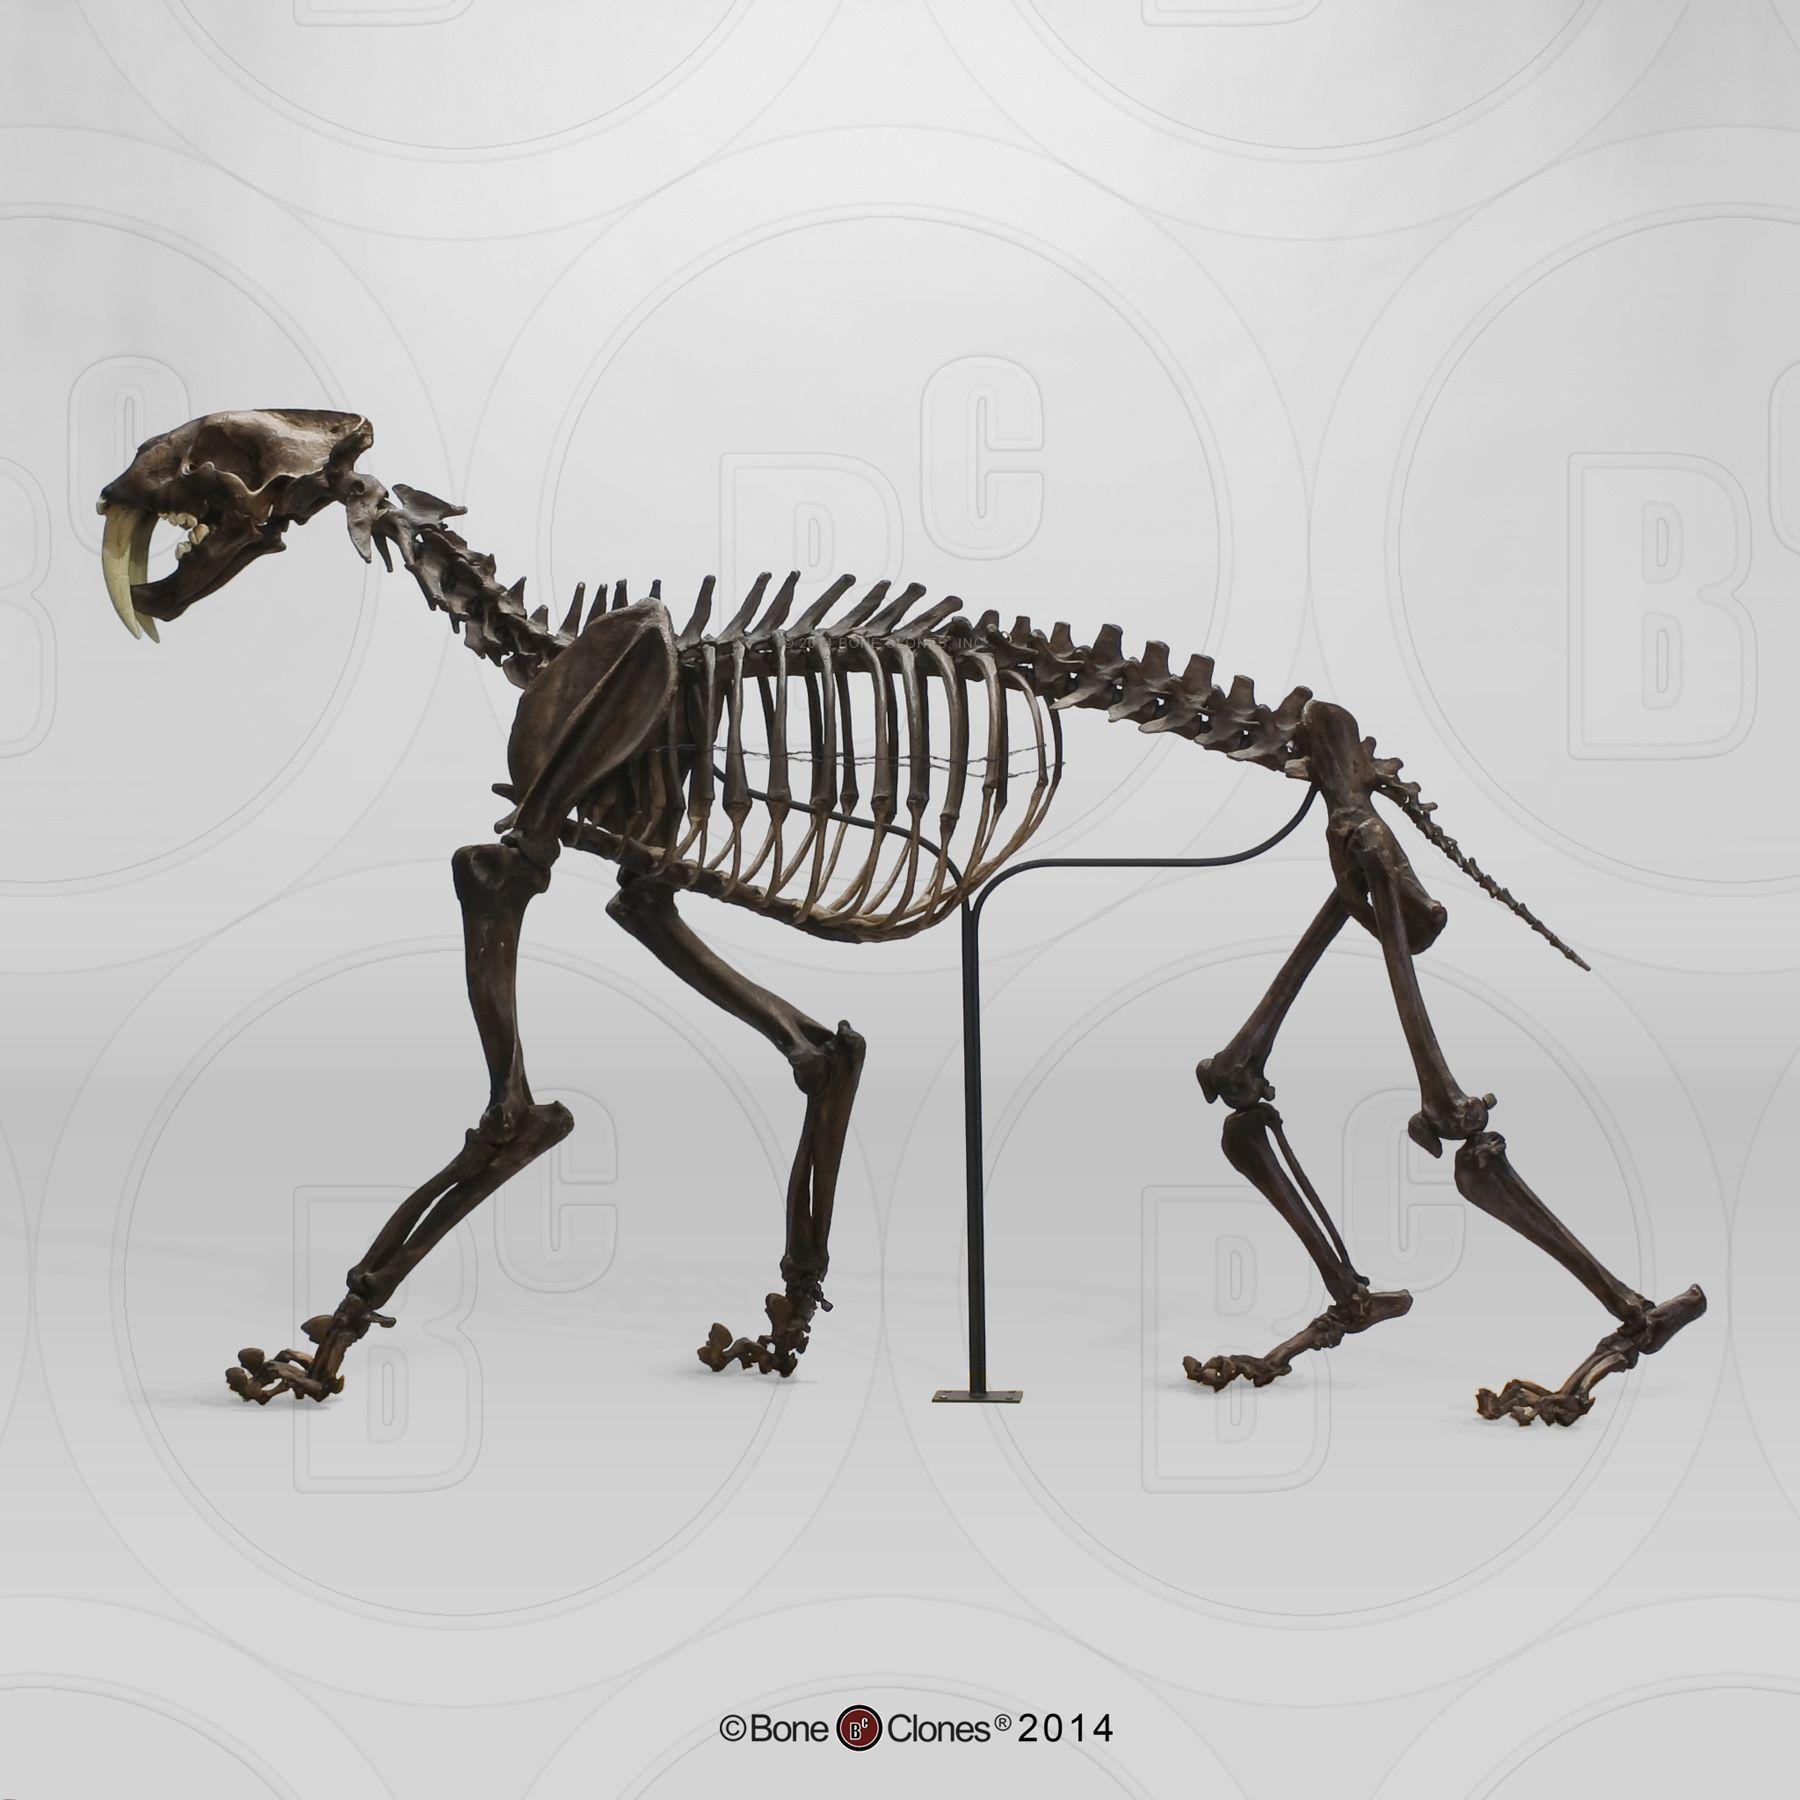 small resolution of resultado de imagen de saber tooth tiger skull replica